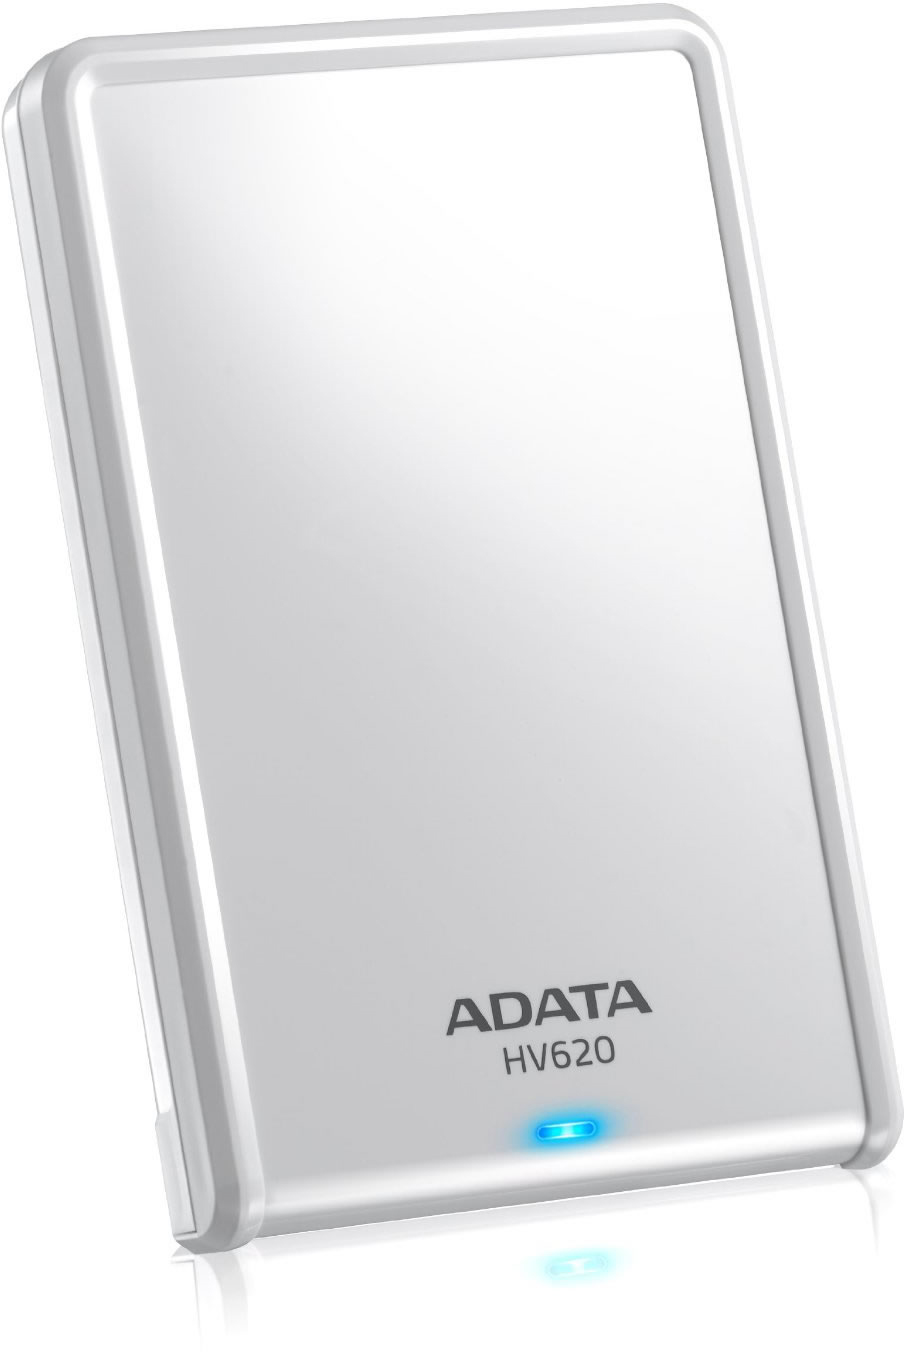 "Adata HV620 2.5"", 1Tb, USB 3.0 (AHV620-1TU3-CWH) - внешний жесткий диск (White)"